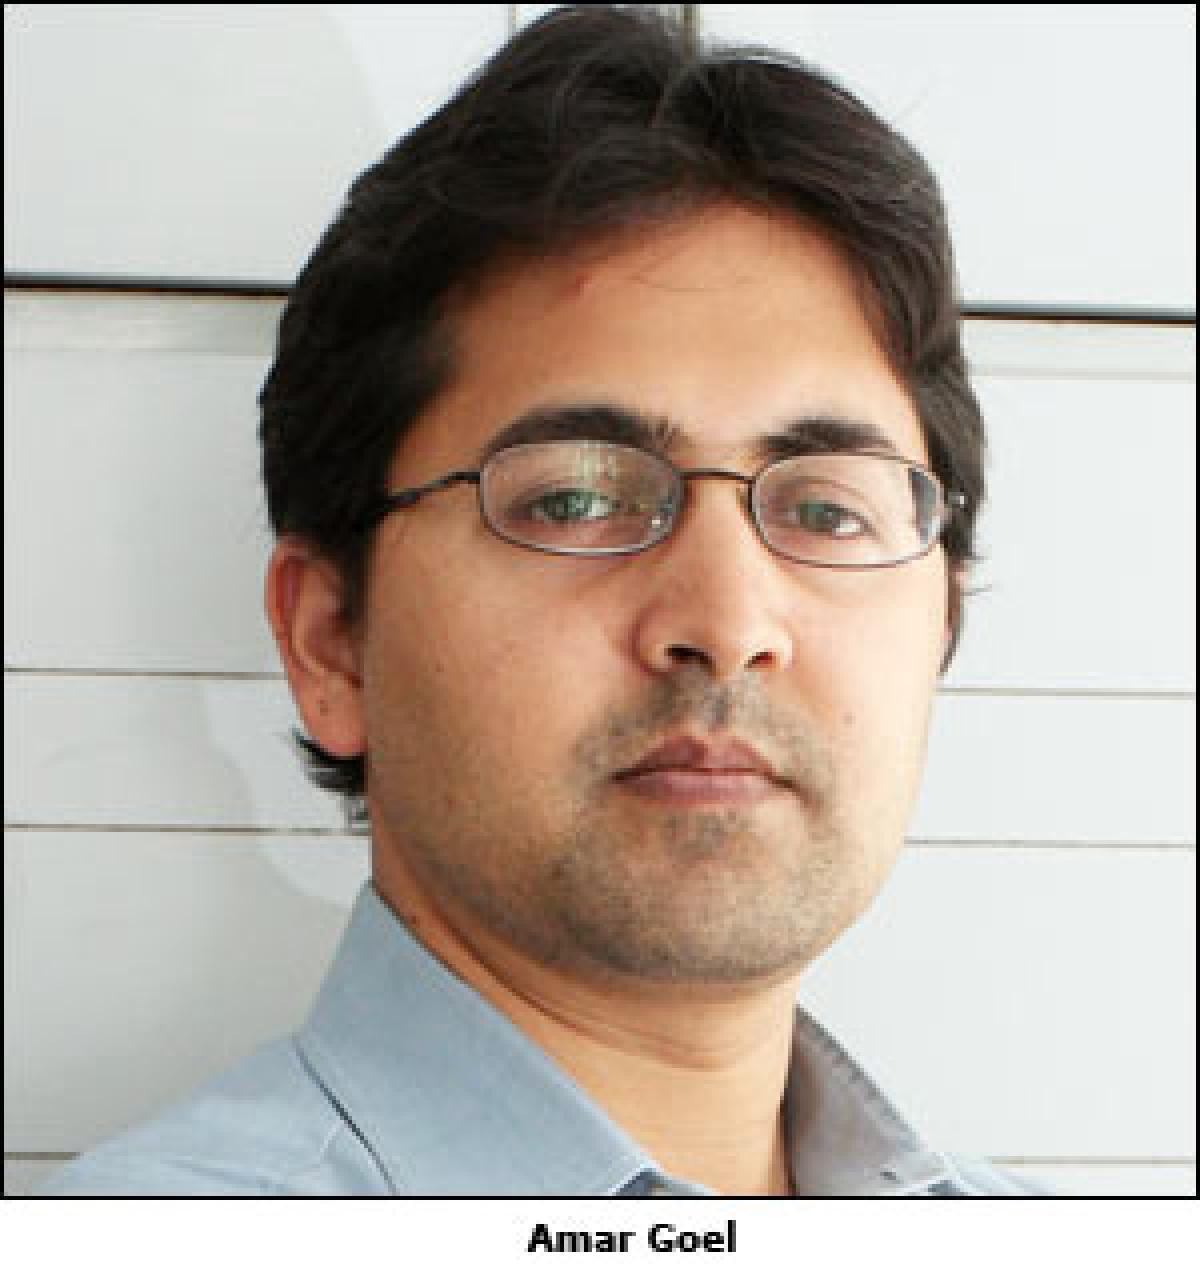 SVG Media and Komli Media to create mobile marketing company